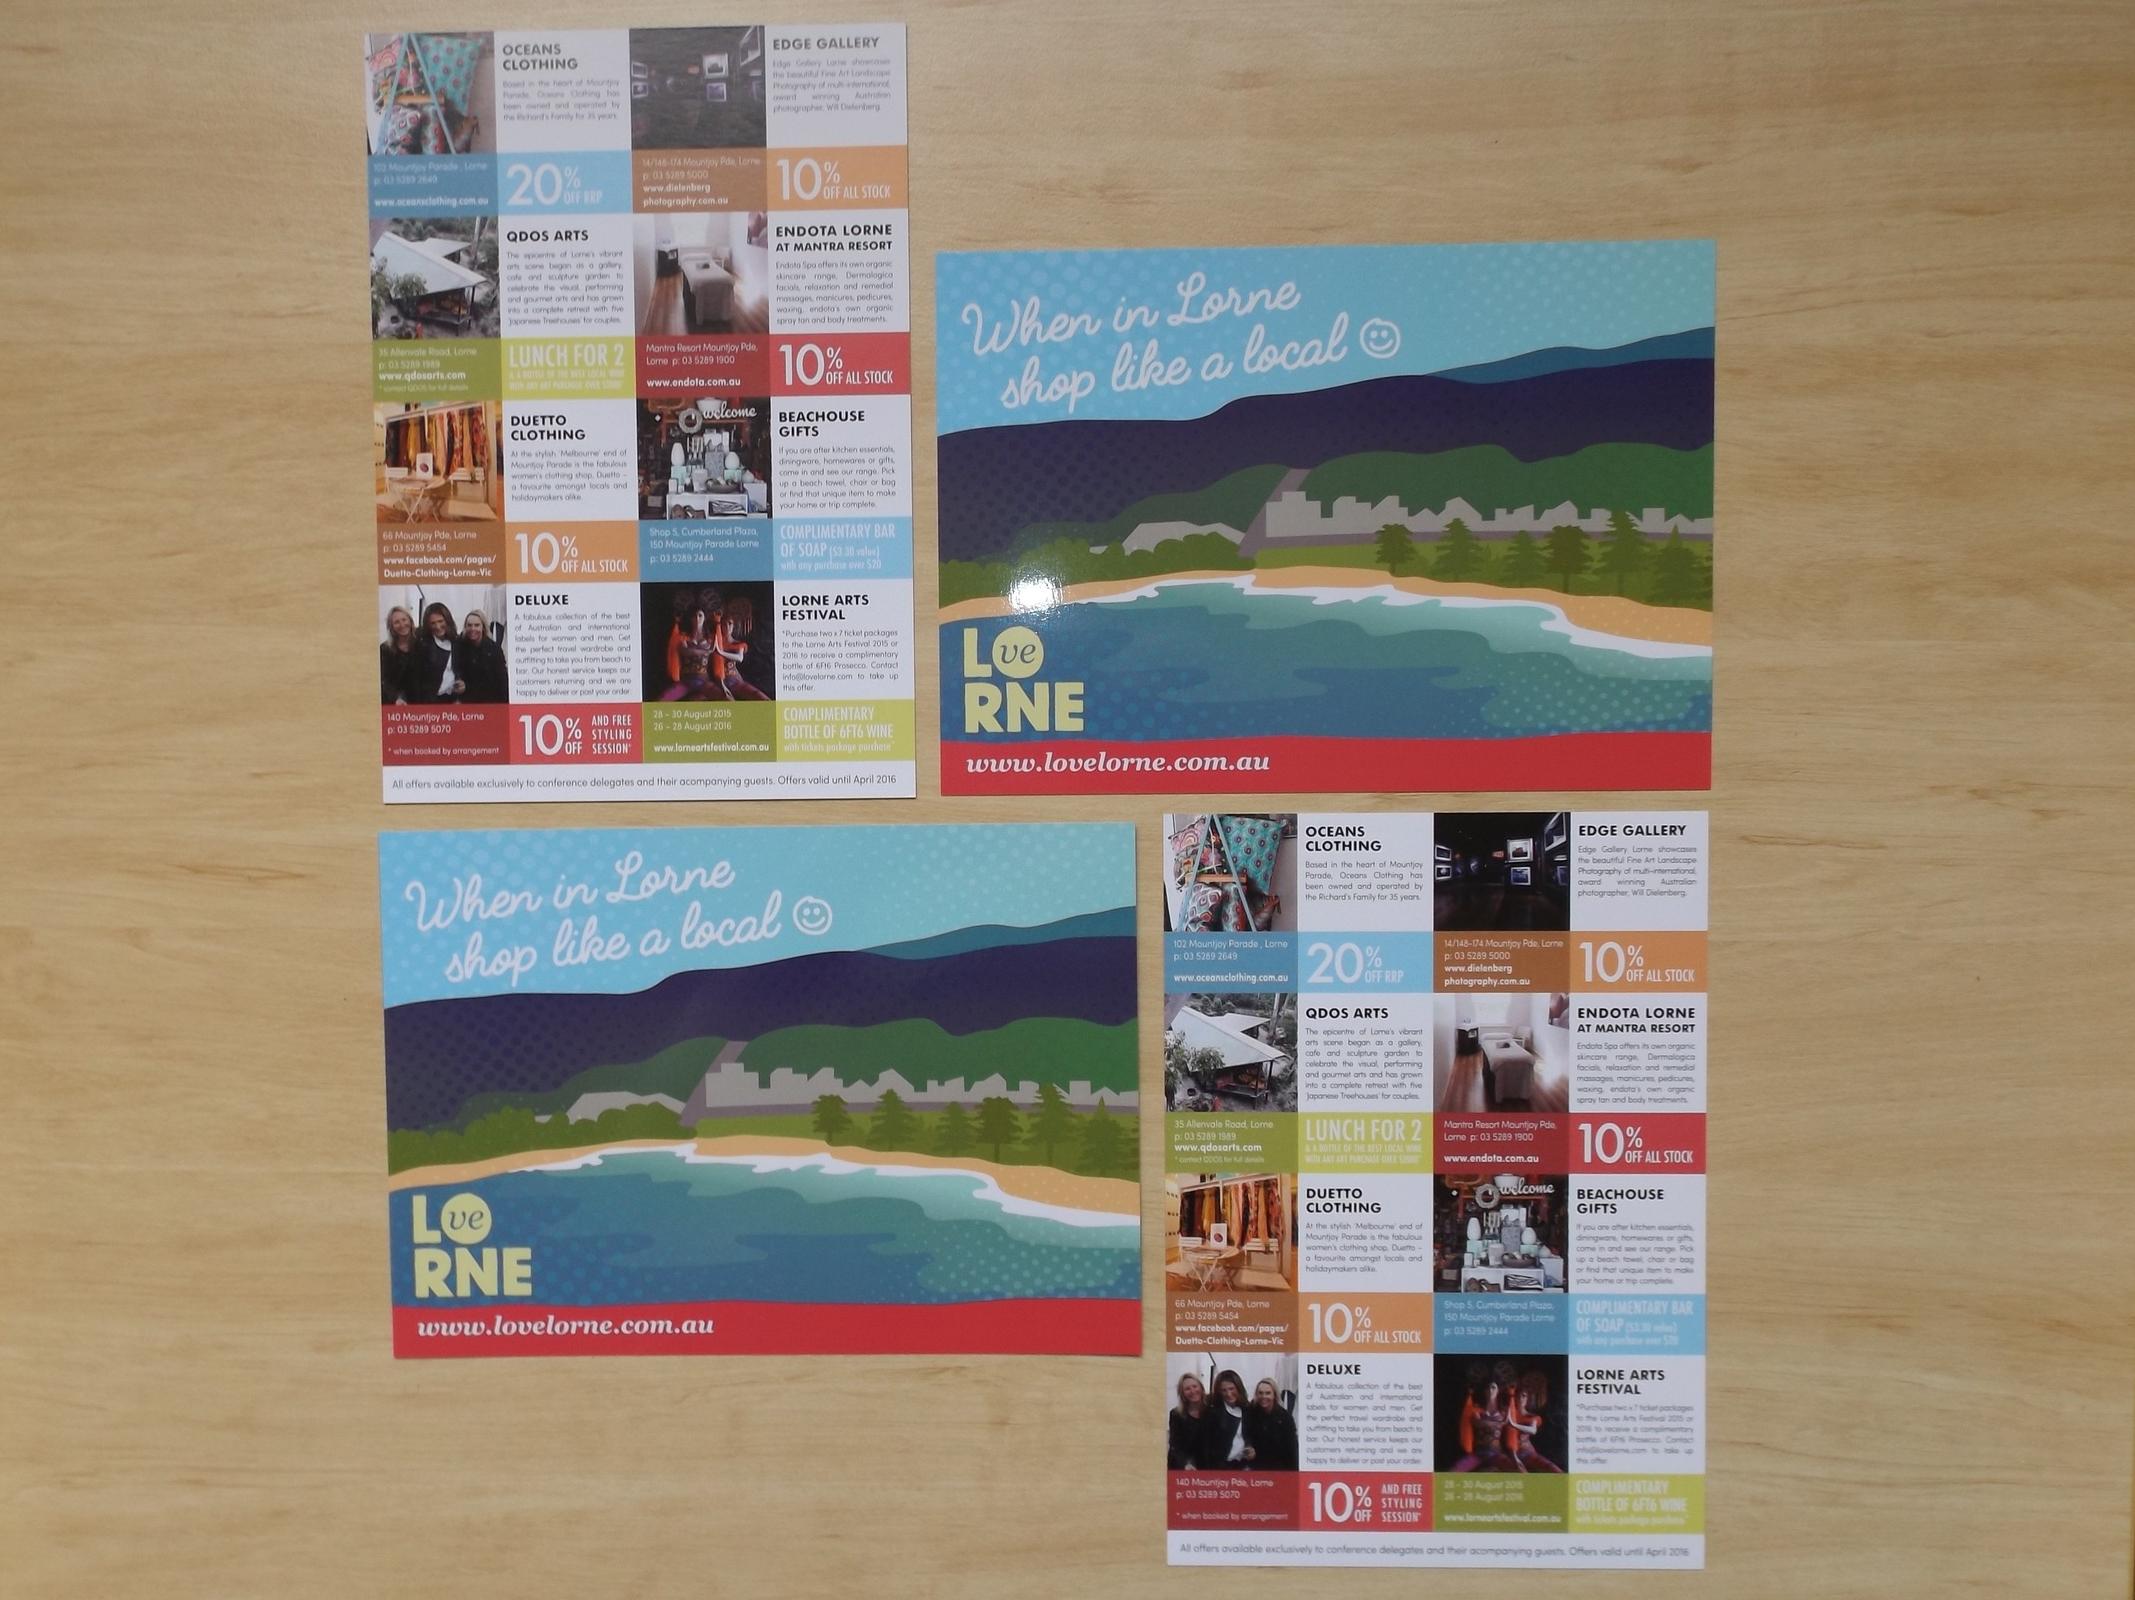 LOVE LORNE: Retail Vouchers Promo Cards